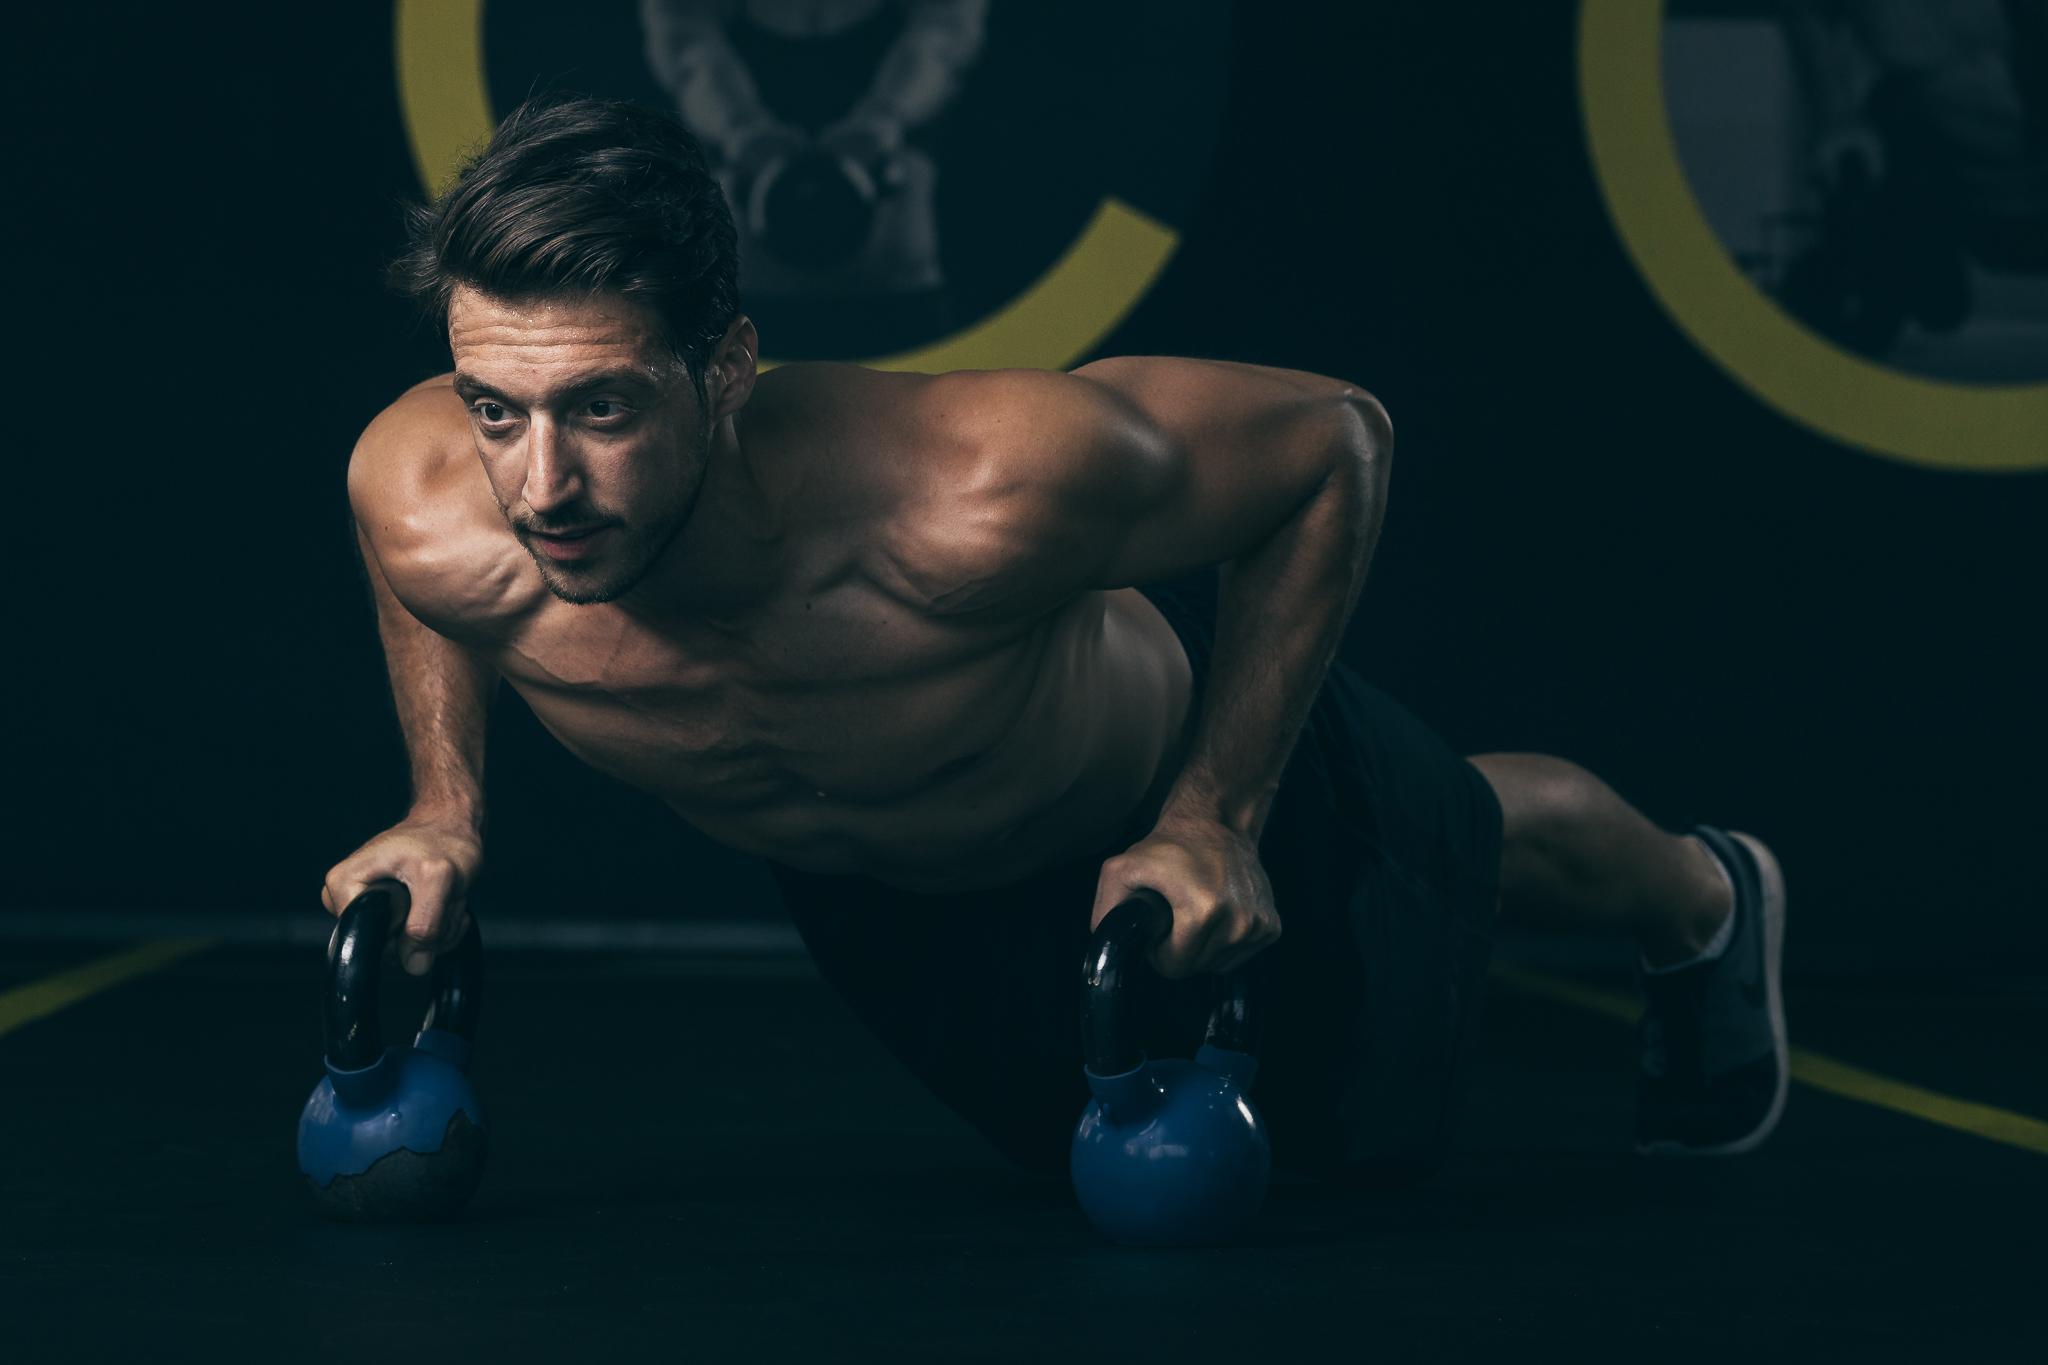 kostis sohoritis fitness photography Giorgos Kitsantas Concept One 11.jpg